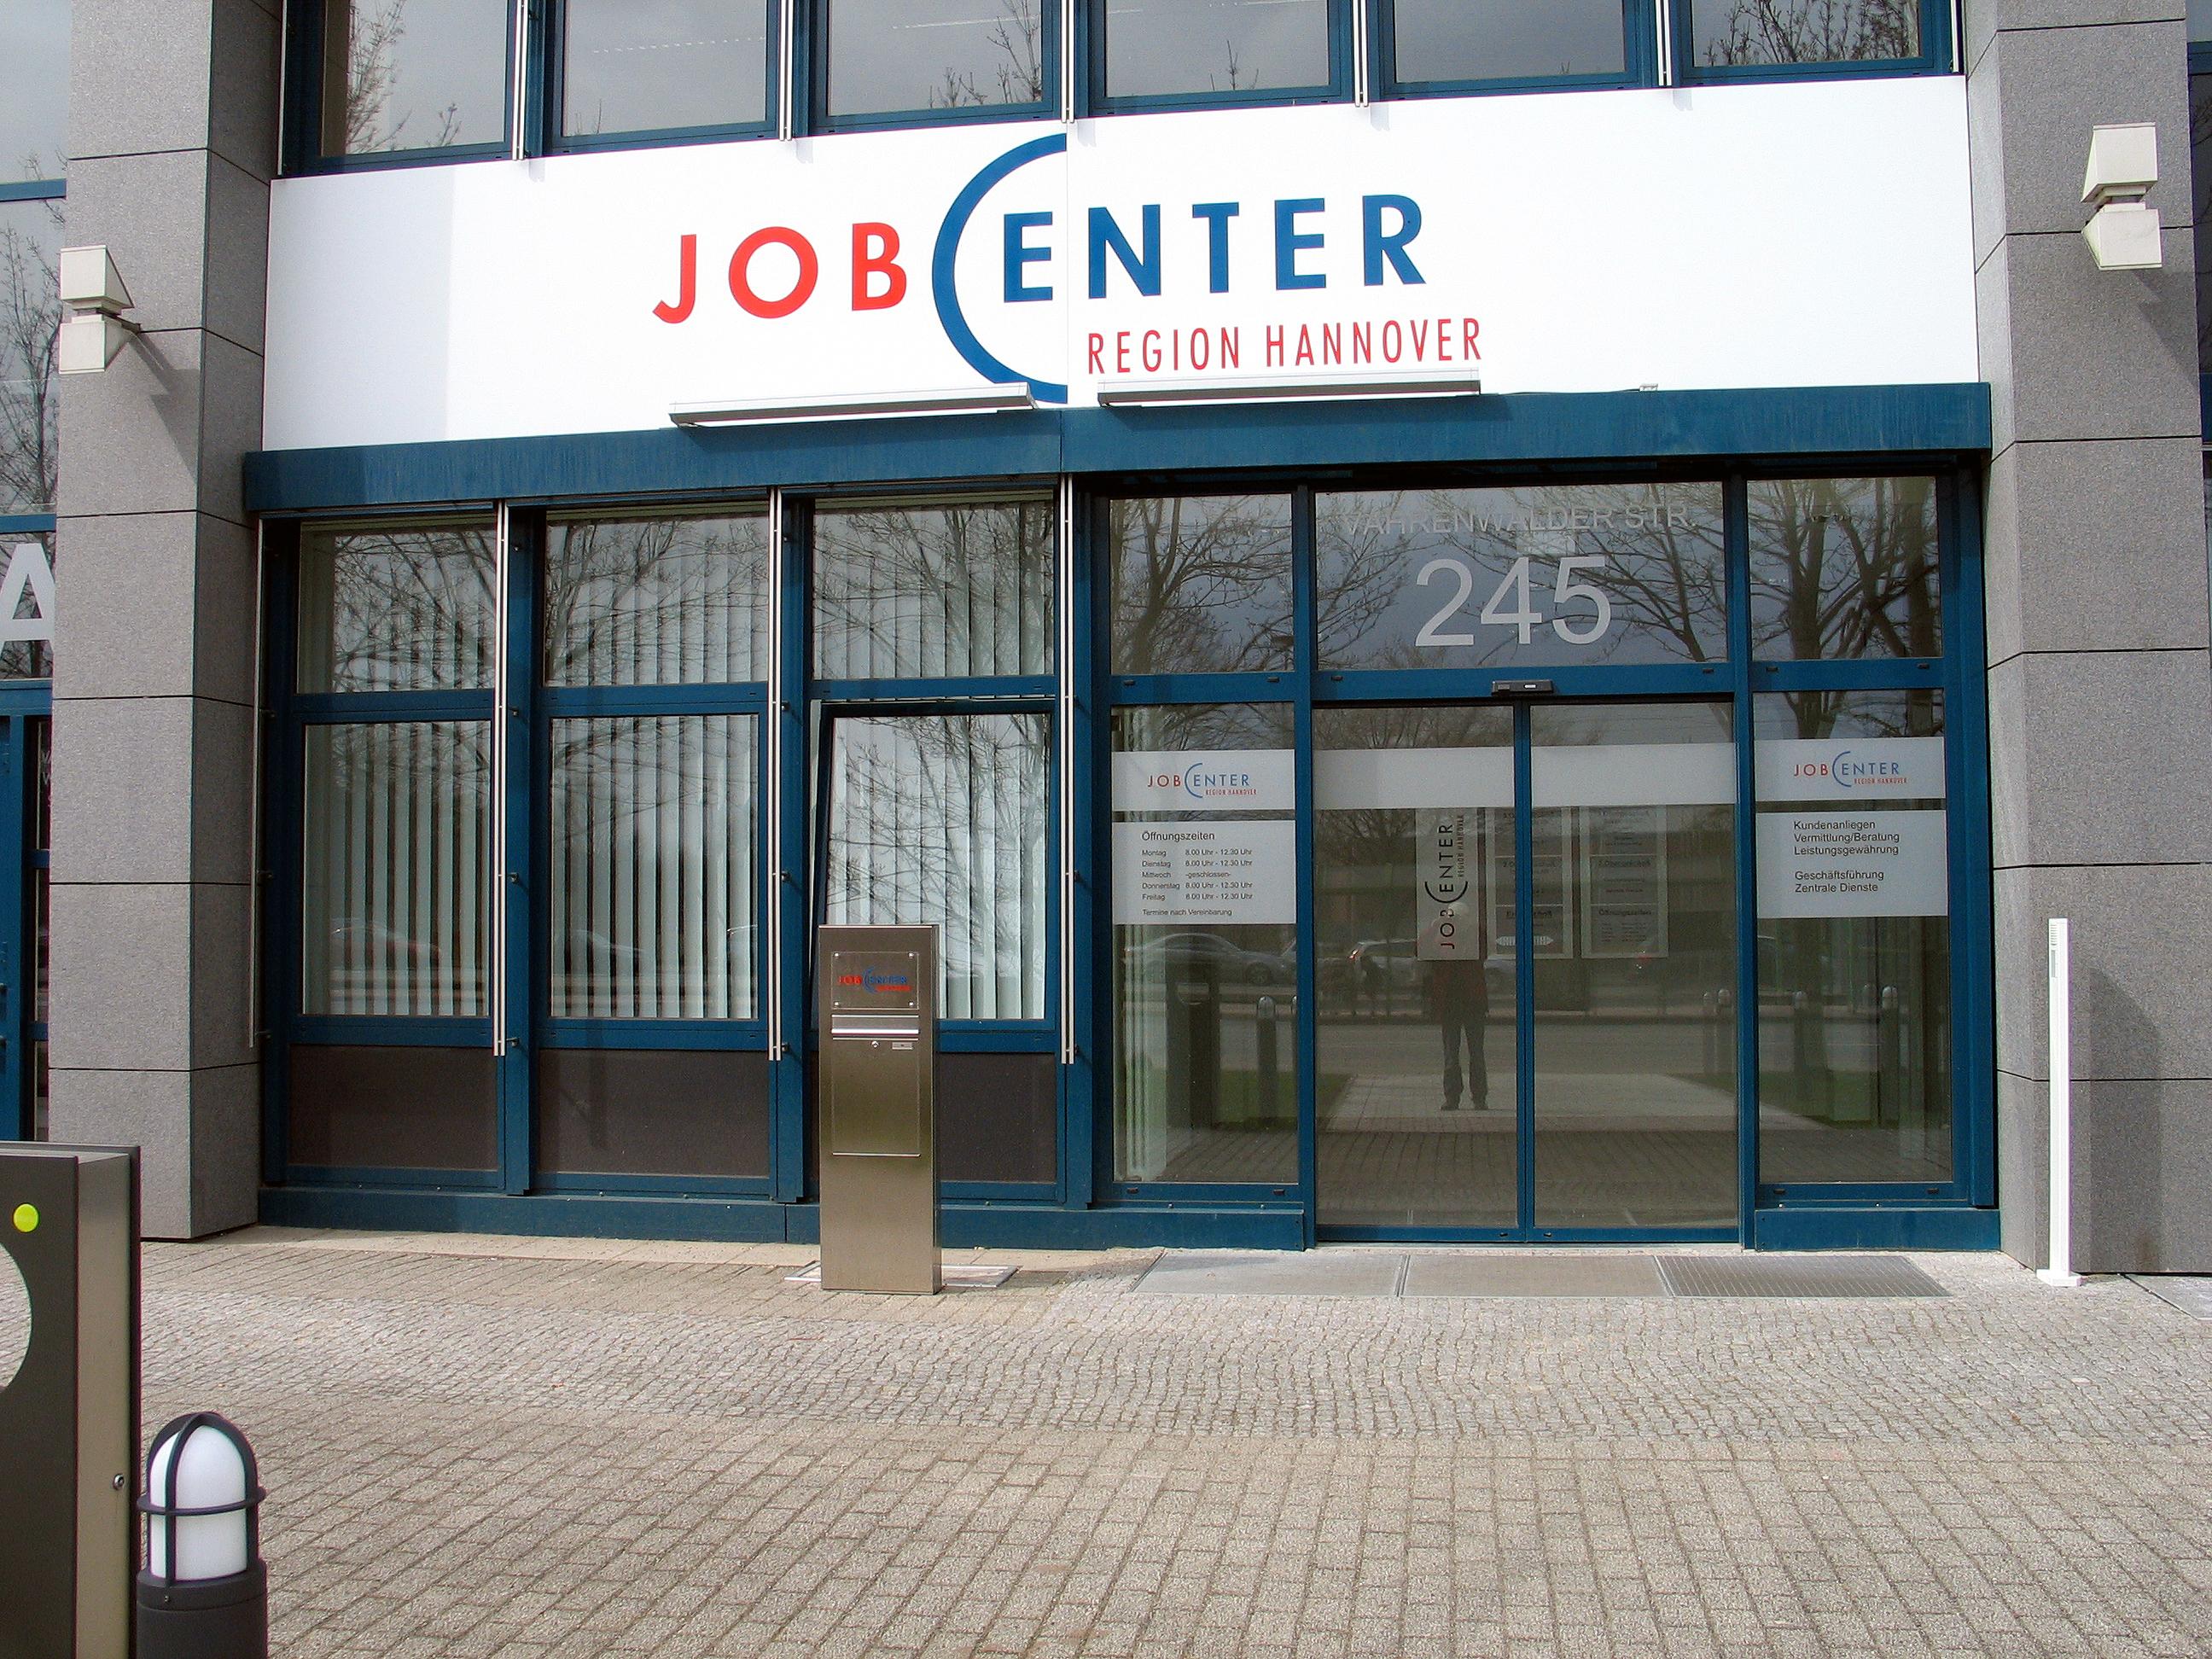 jobcenter økonomi wiki